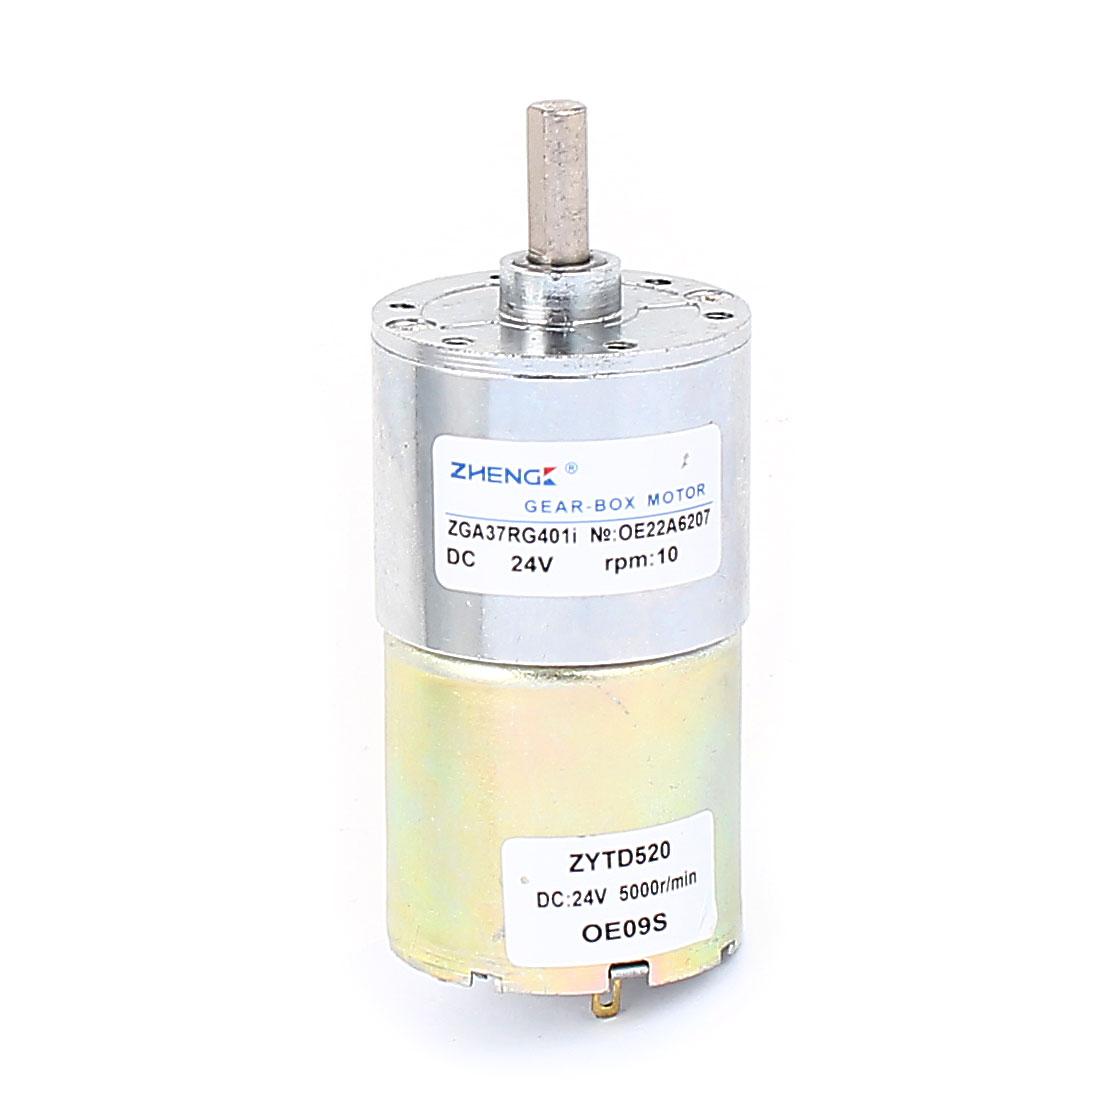 6mm Dia Shaft Soldering Pin Gear Box Speed Reducing DC Geared Motor 24V 10RPM